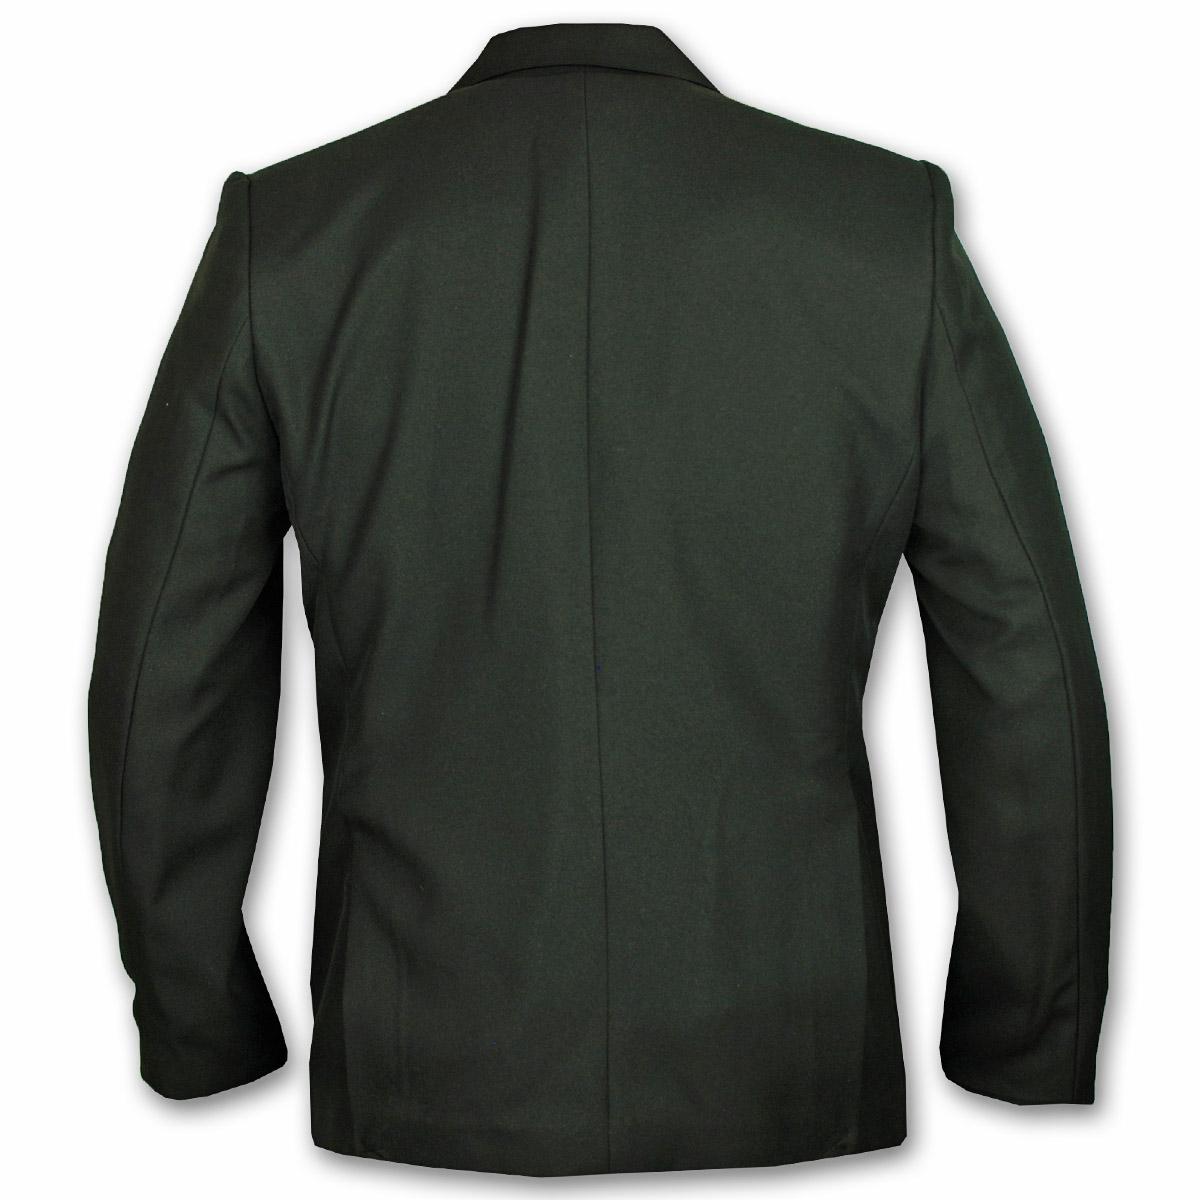 Boys Girls Blazer School Uniform Jacket Coat Black Formal Buttons ...